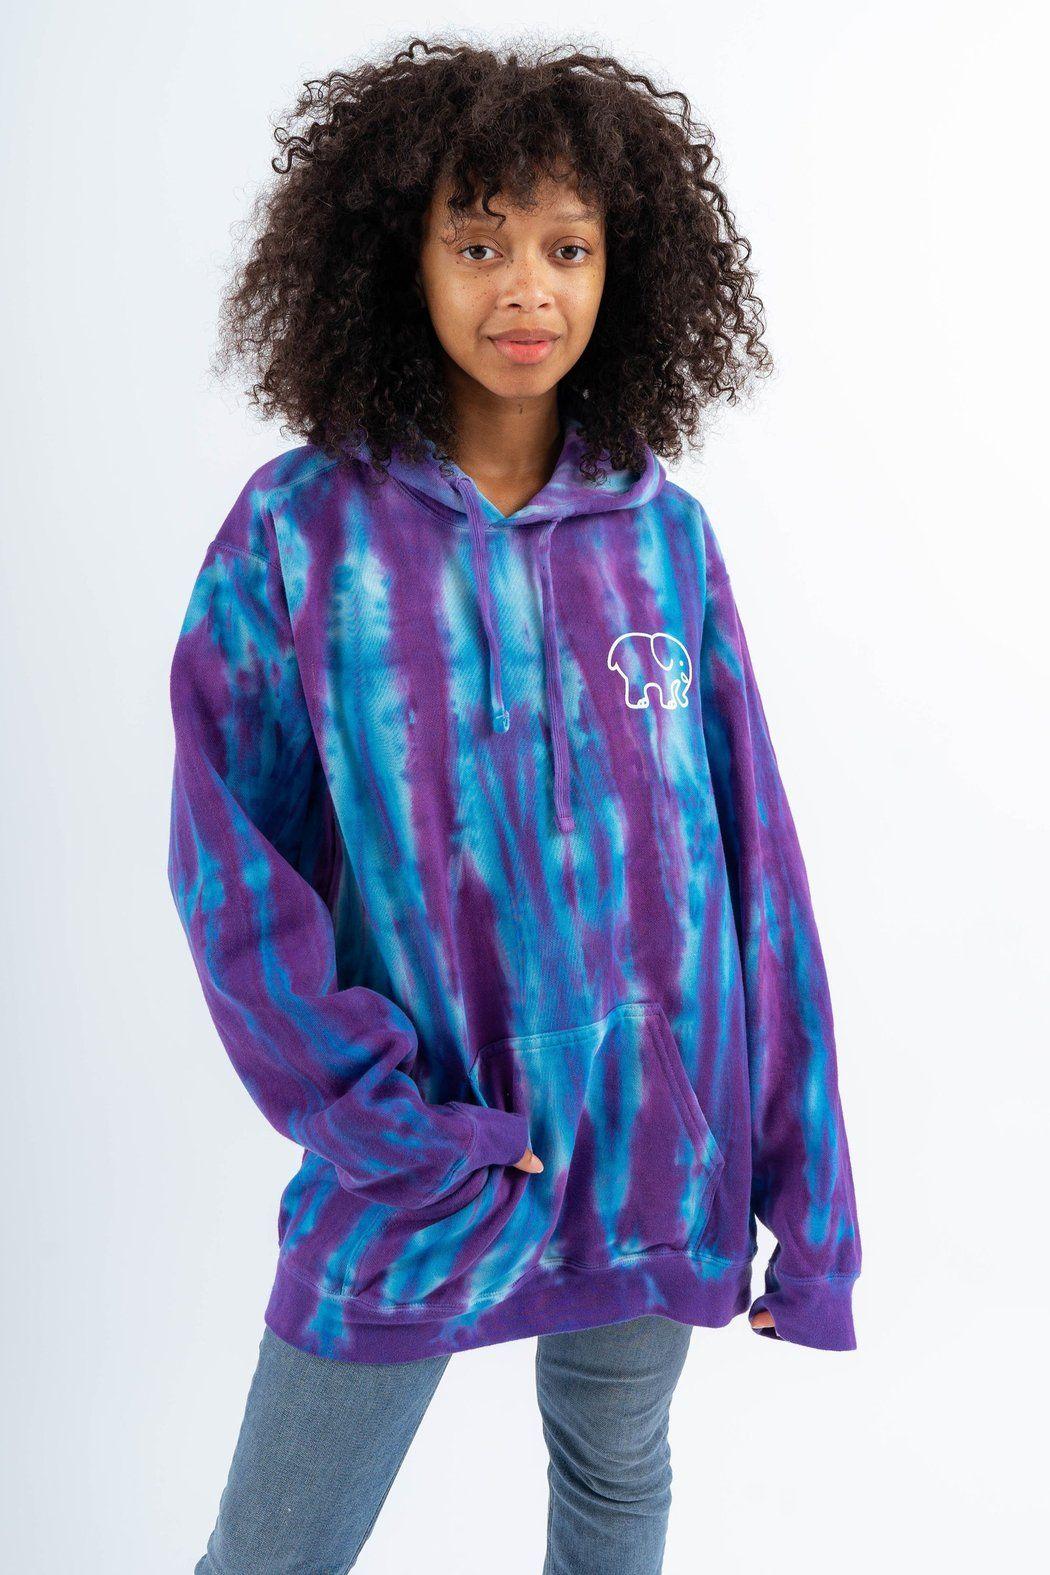 Oversized Turquoise Purple Tie Dye Hoodie Ivory Ella Tie Dye Hoodie Purple Tie Dye Tie Dye [ 1575 x 1050 Pixel ]